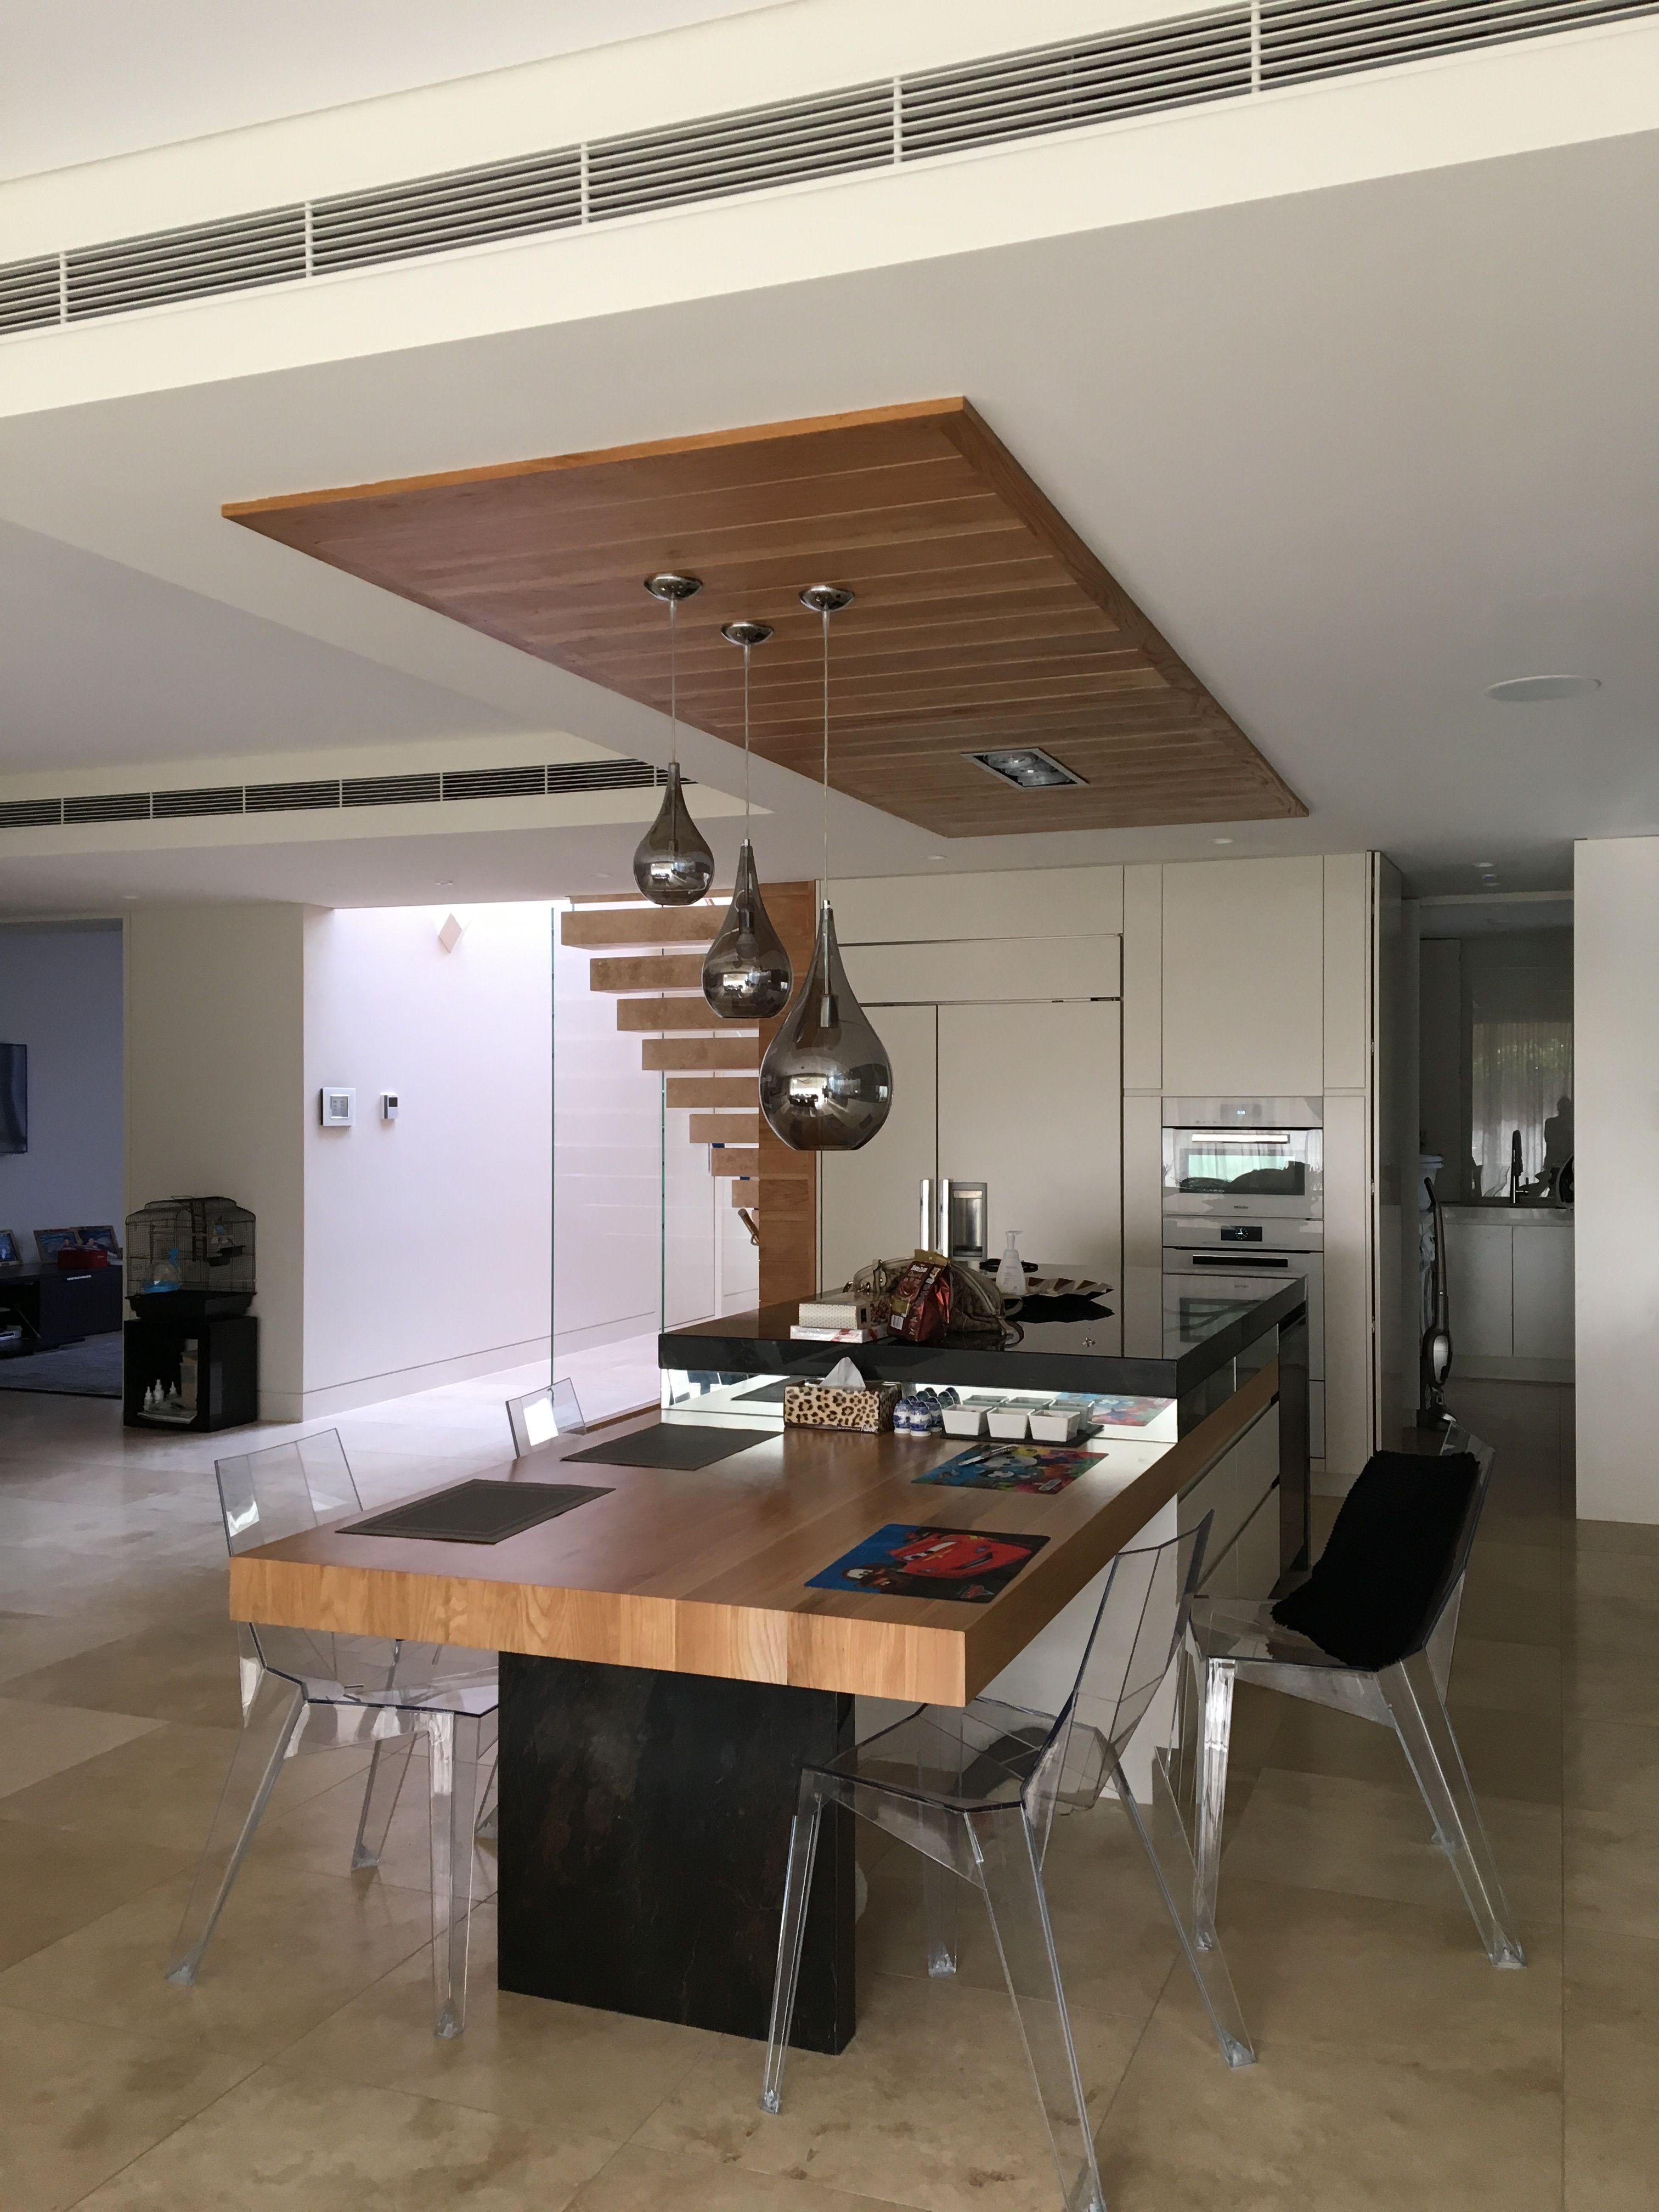 23 Dining Room Ceiling Designs Decorating Ideas: Ceiling Design Living Room, Kitchen Ceiling Design, Bedroom False Ceiling Design